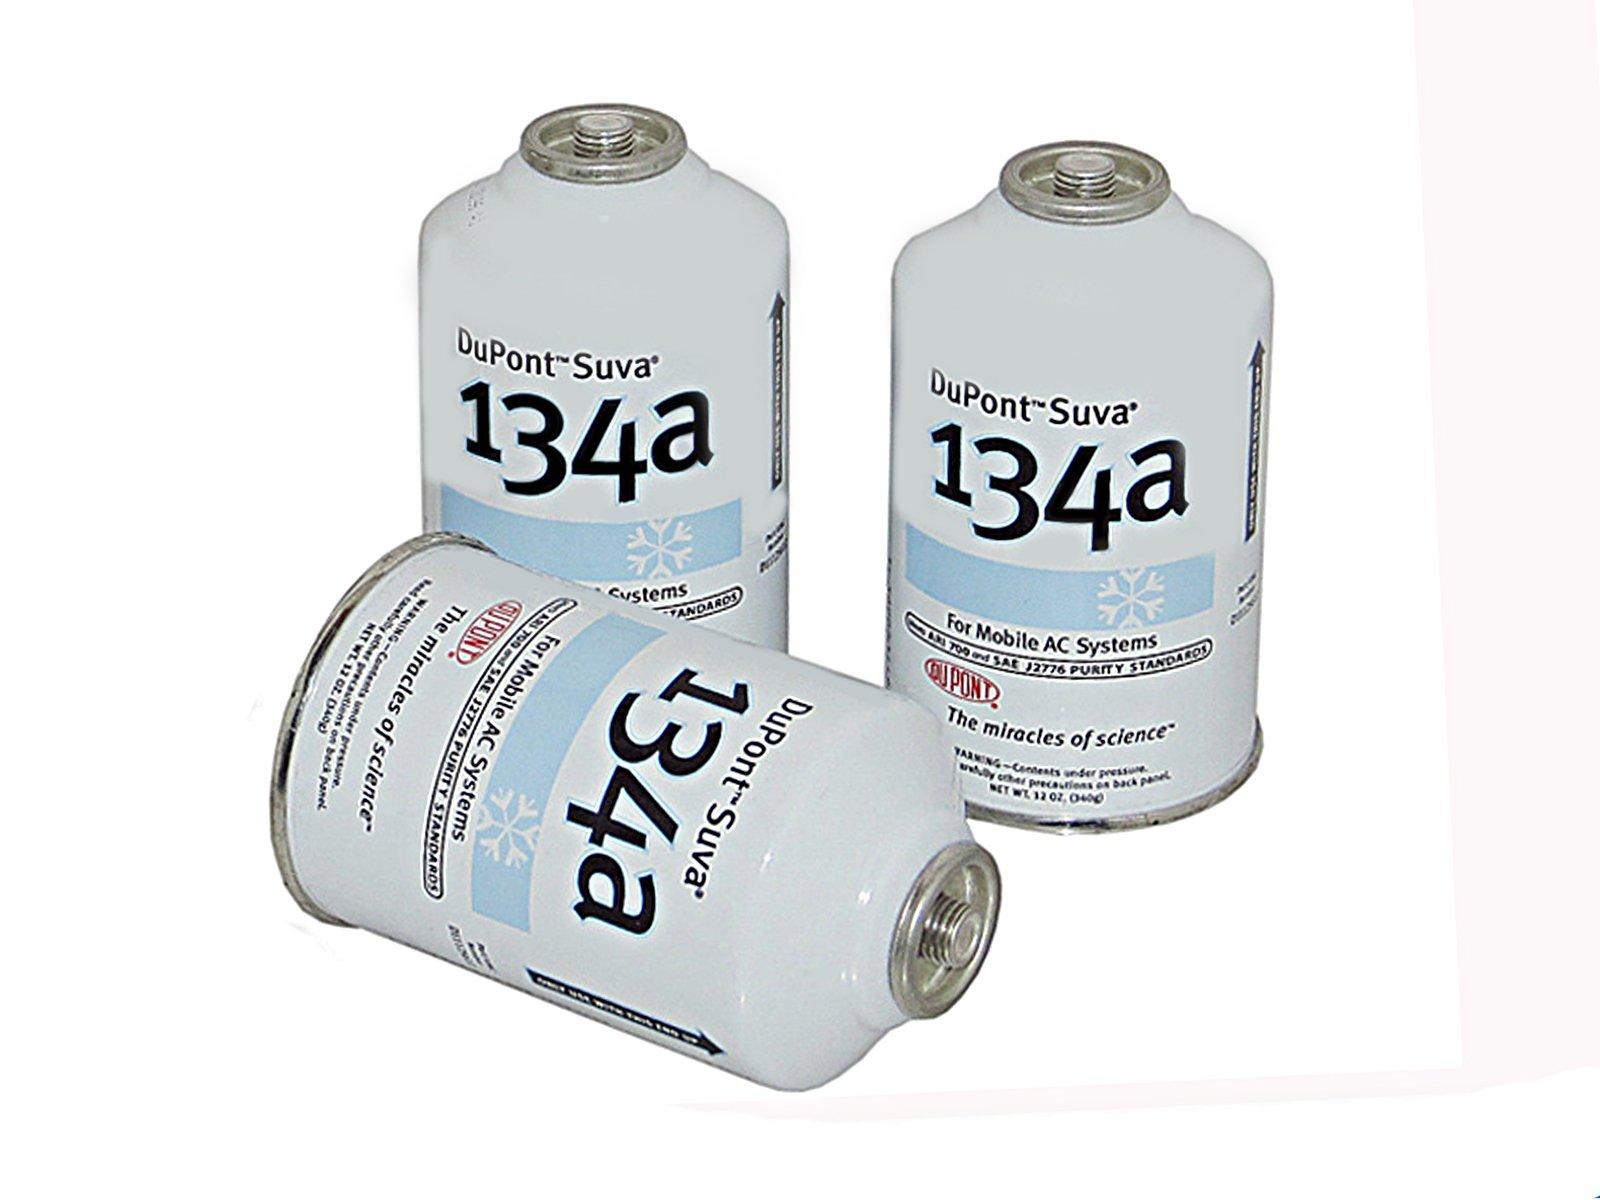 DuPont 3 Cans R-134a Suva A/C Automotive Refrigerant/Freon R134a (12oz Cans)